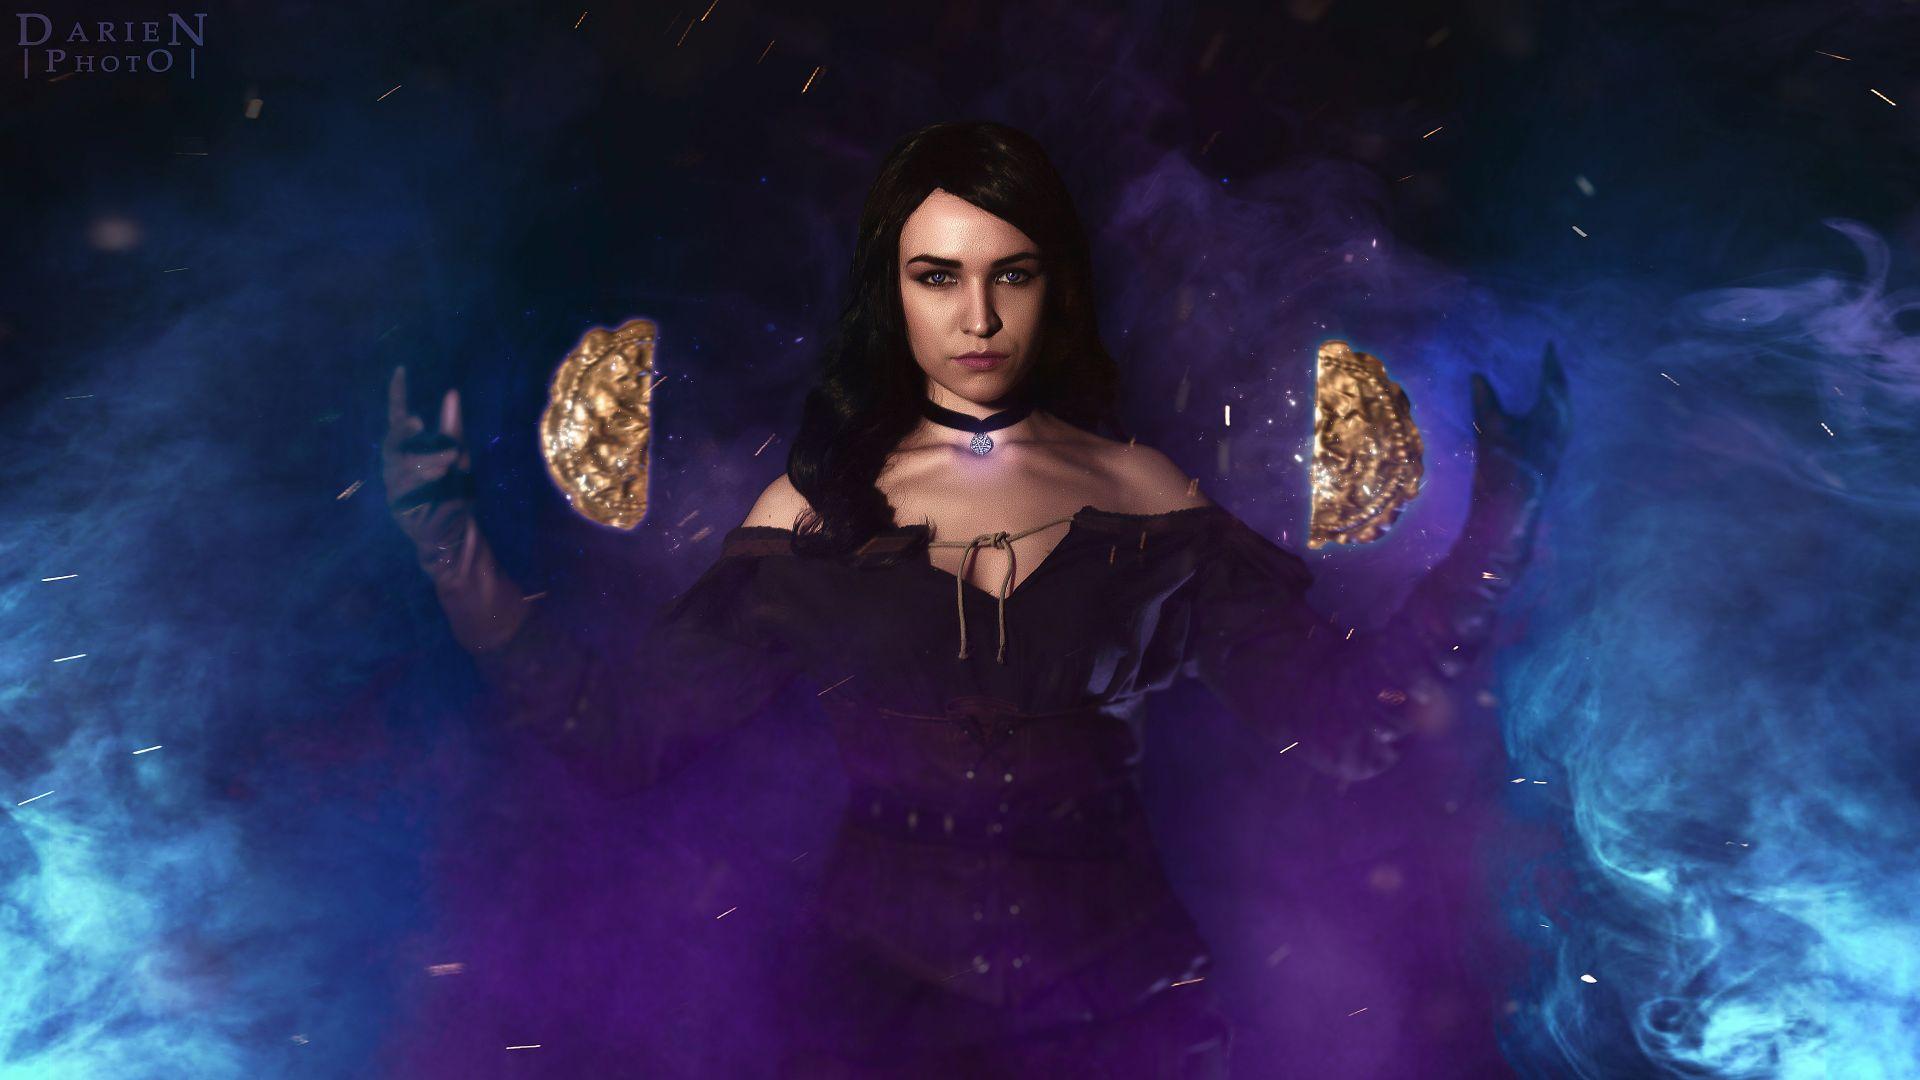 Witcher Yennefer, PC Wallpaper